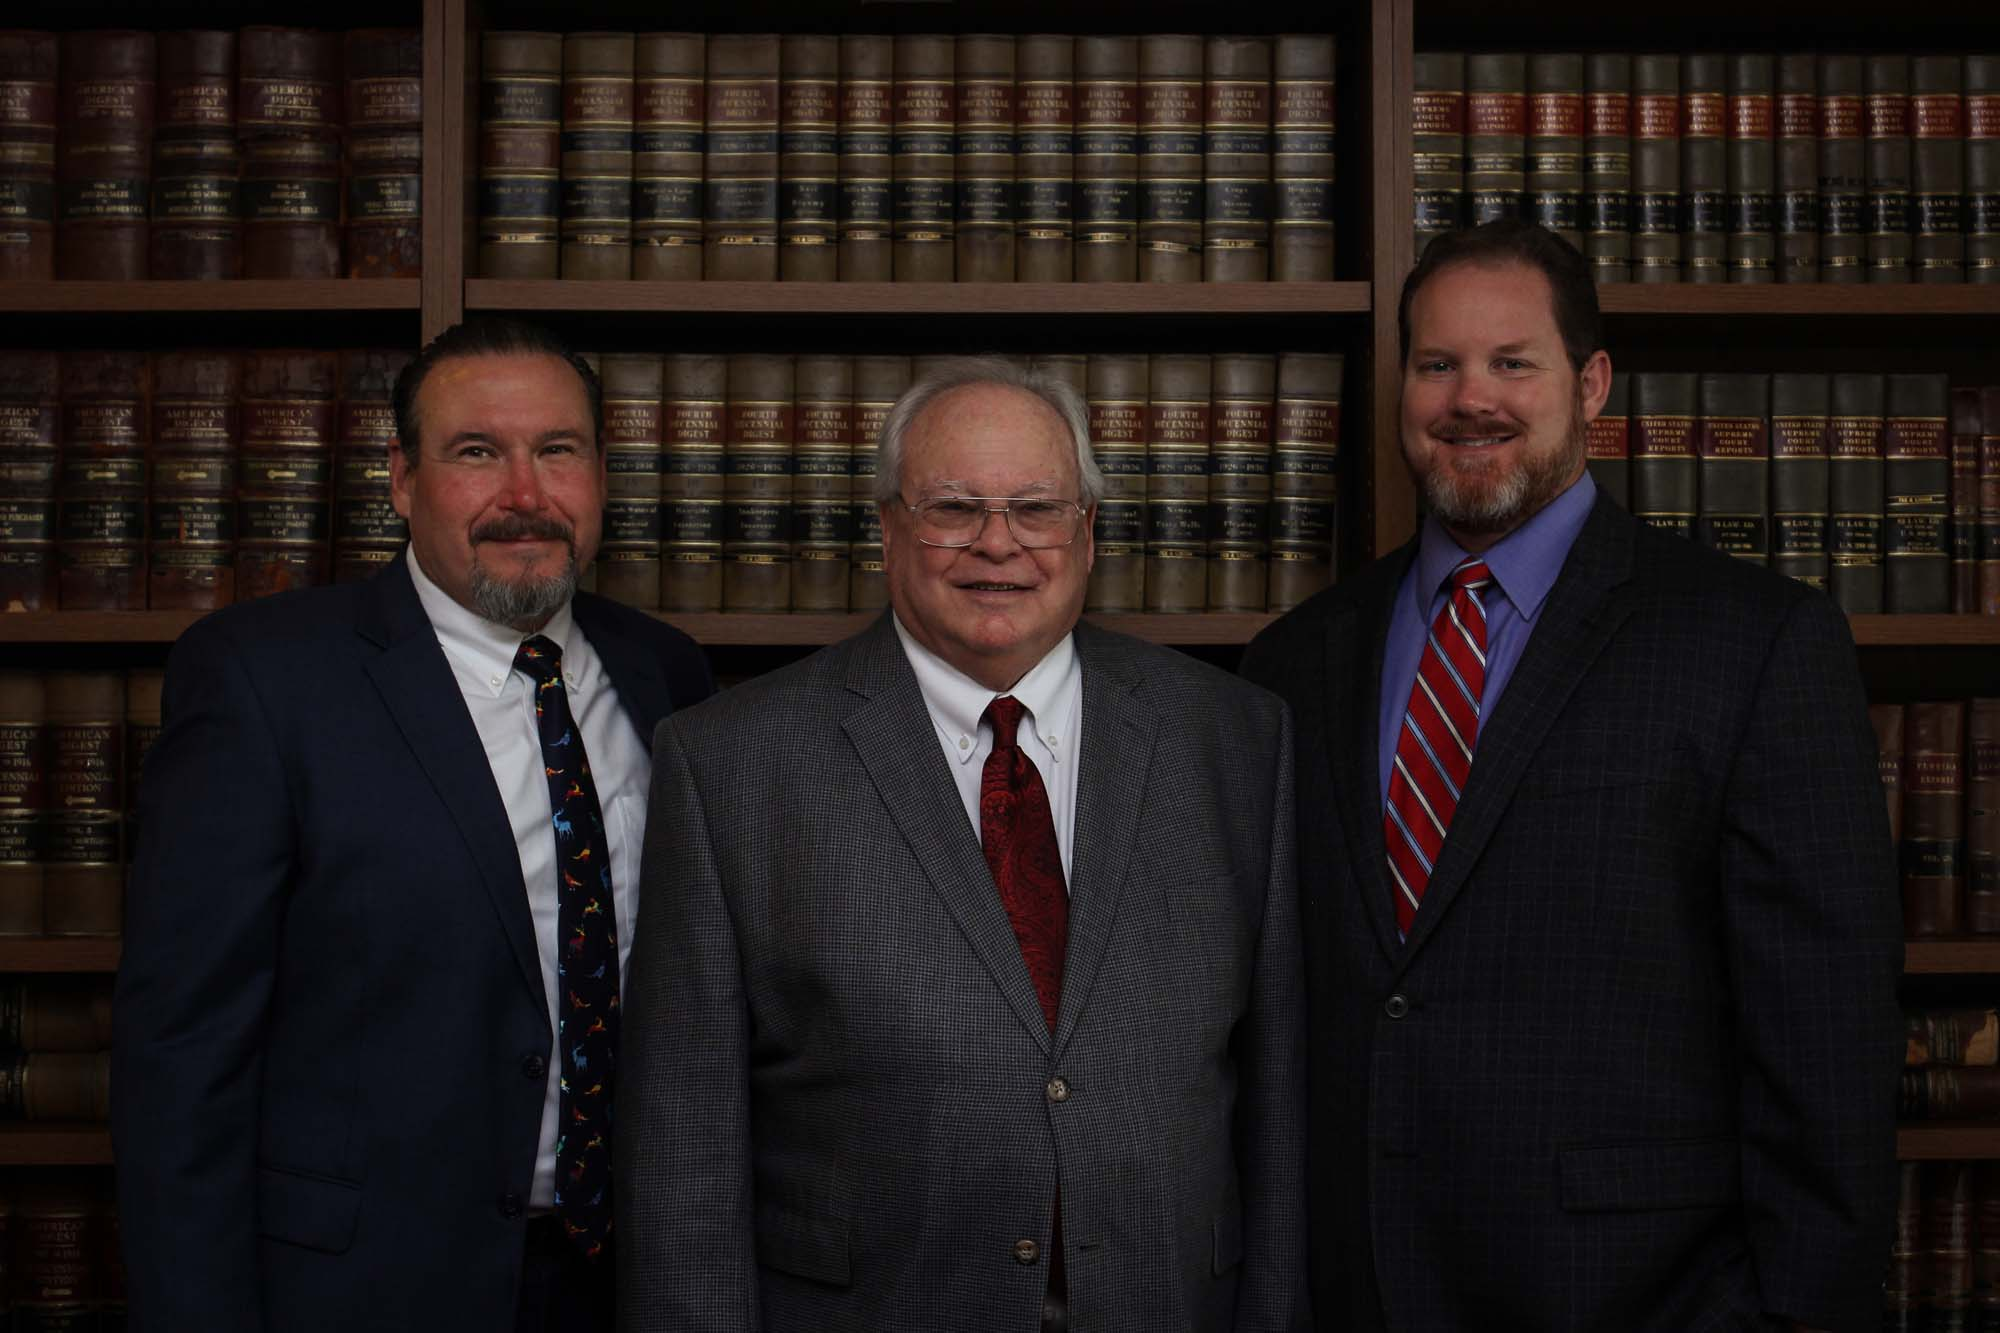 Fee Yates Law - Top Law Firm in Fort Pierce Florida - Established 1905